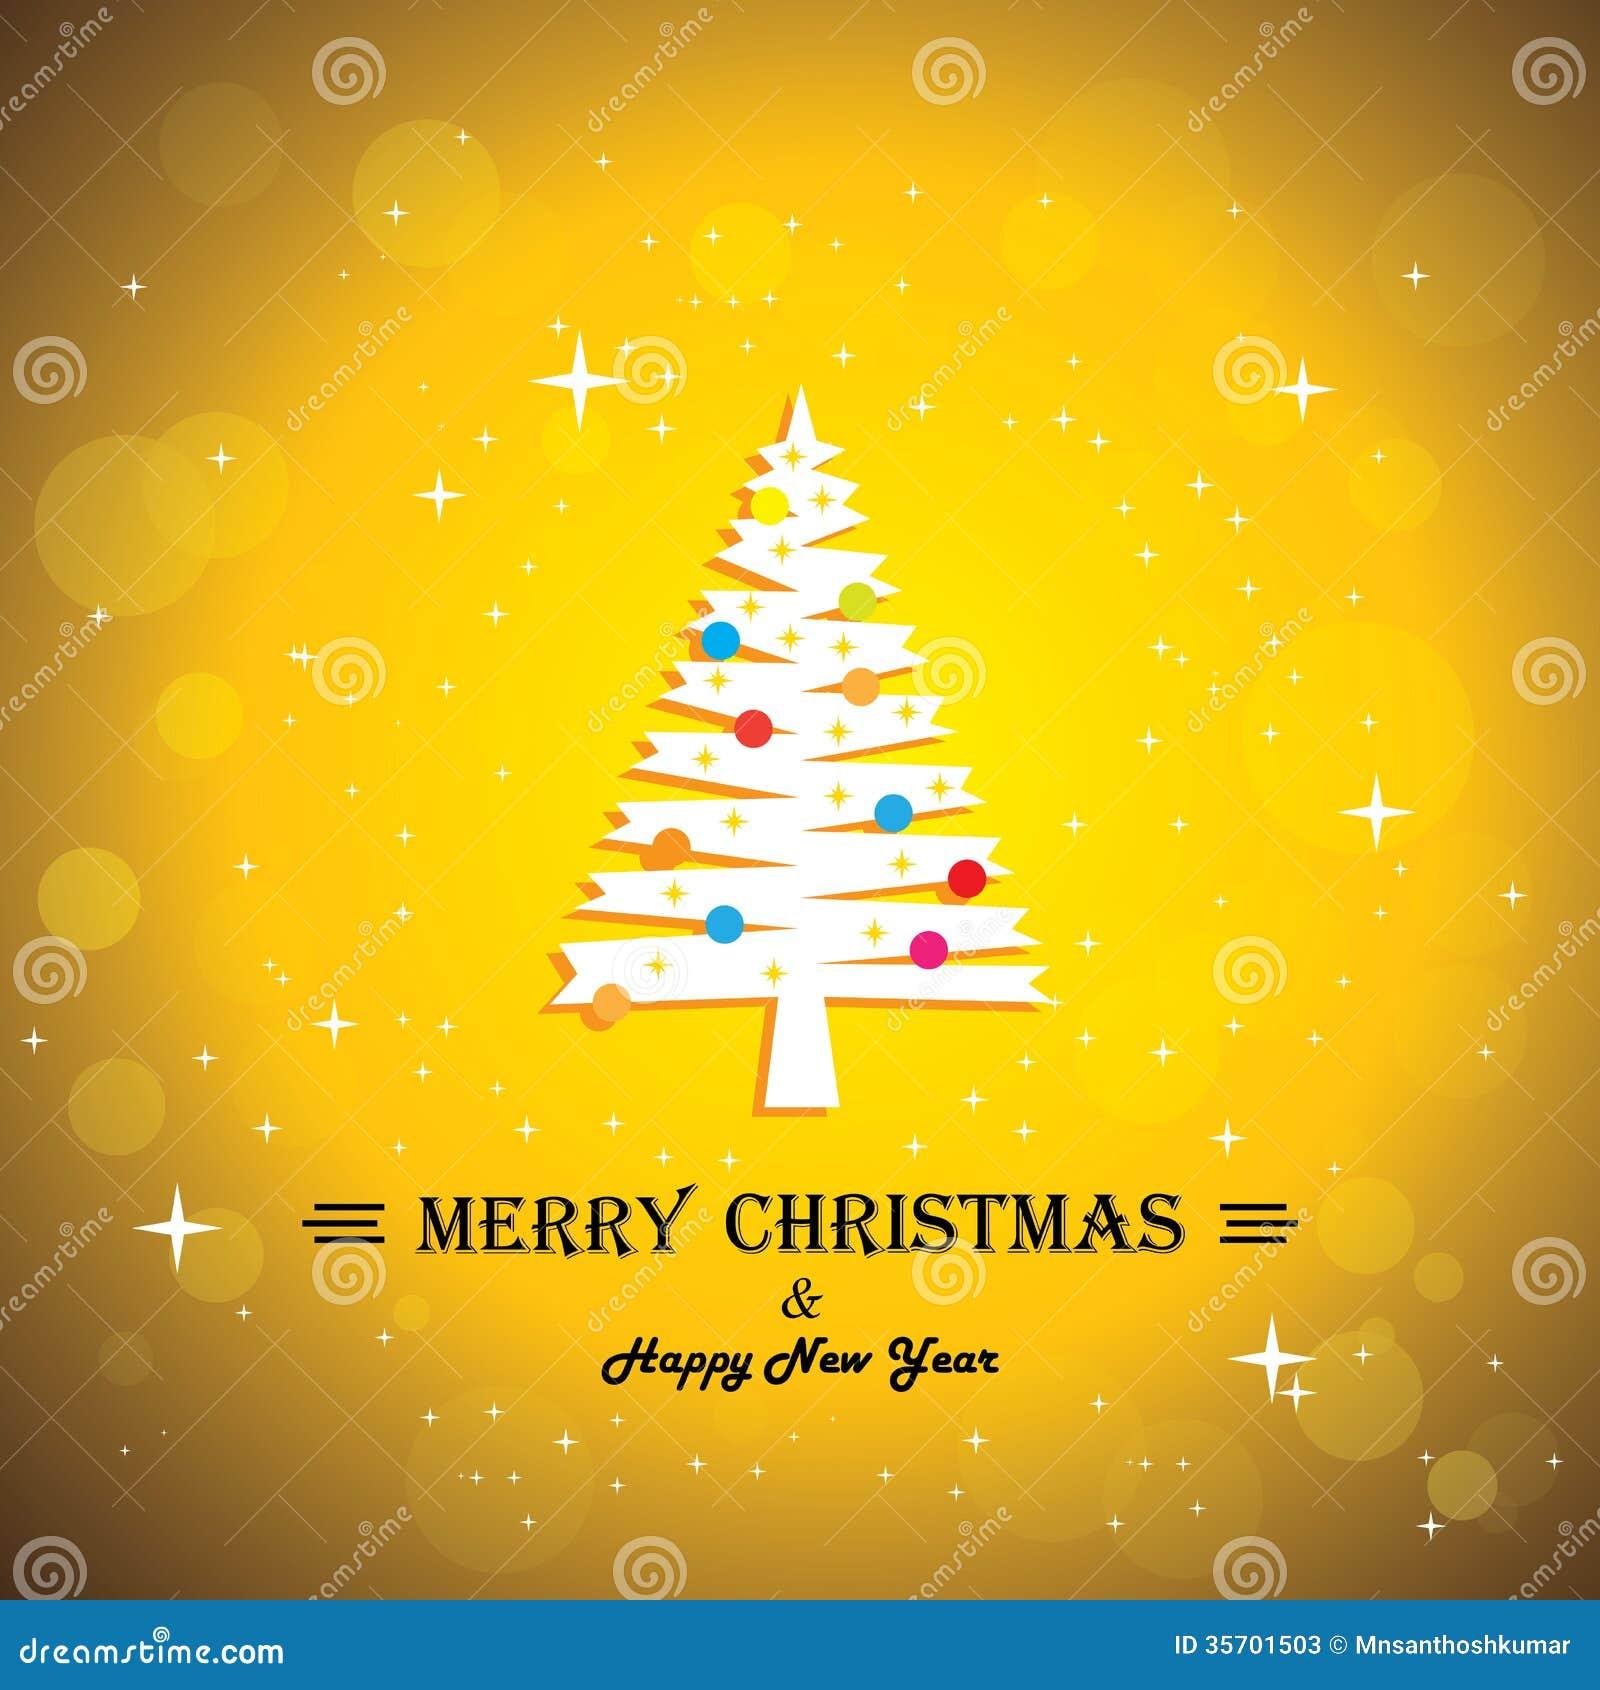 Merry Christmas Greeting Card Poster Xmas Tree Stock Vector